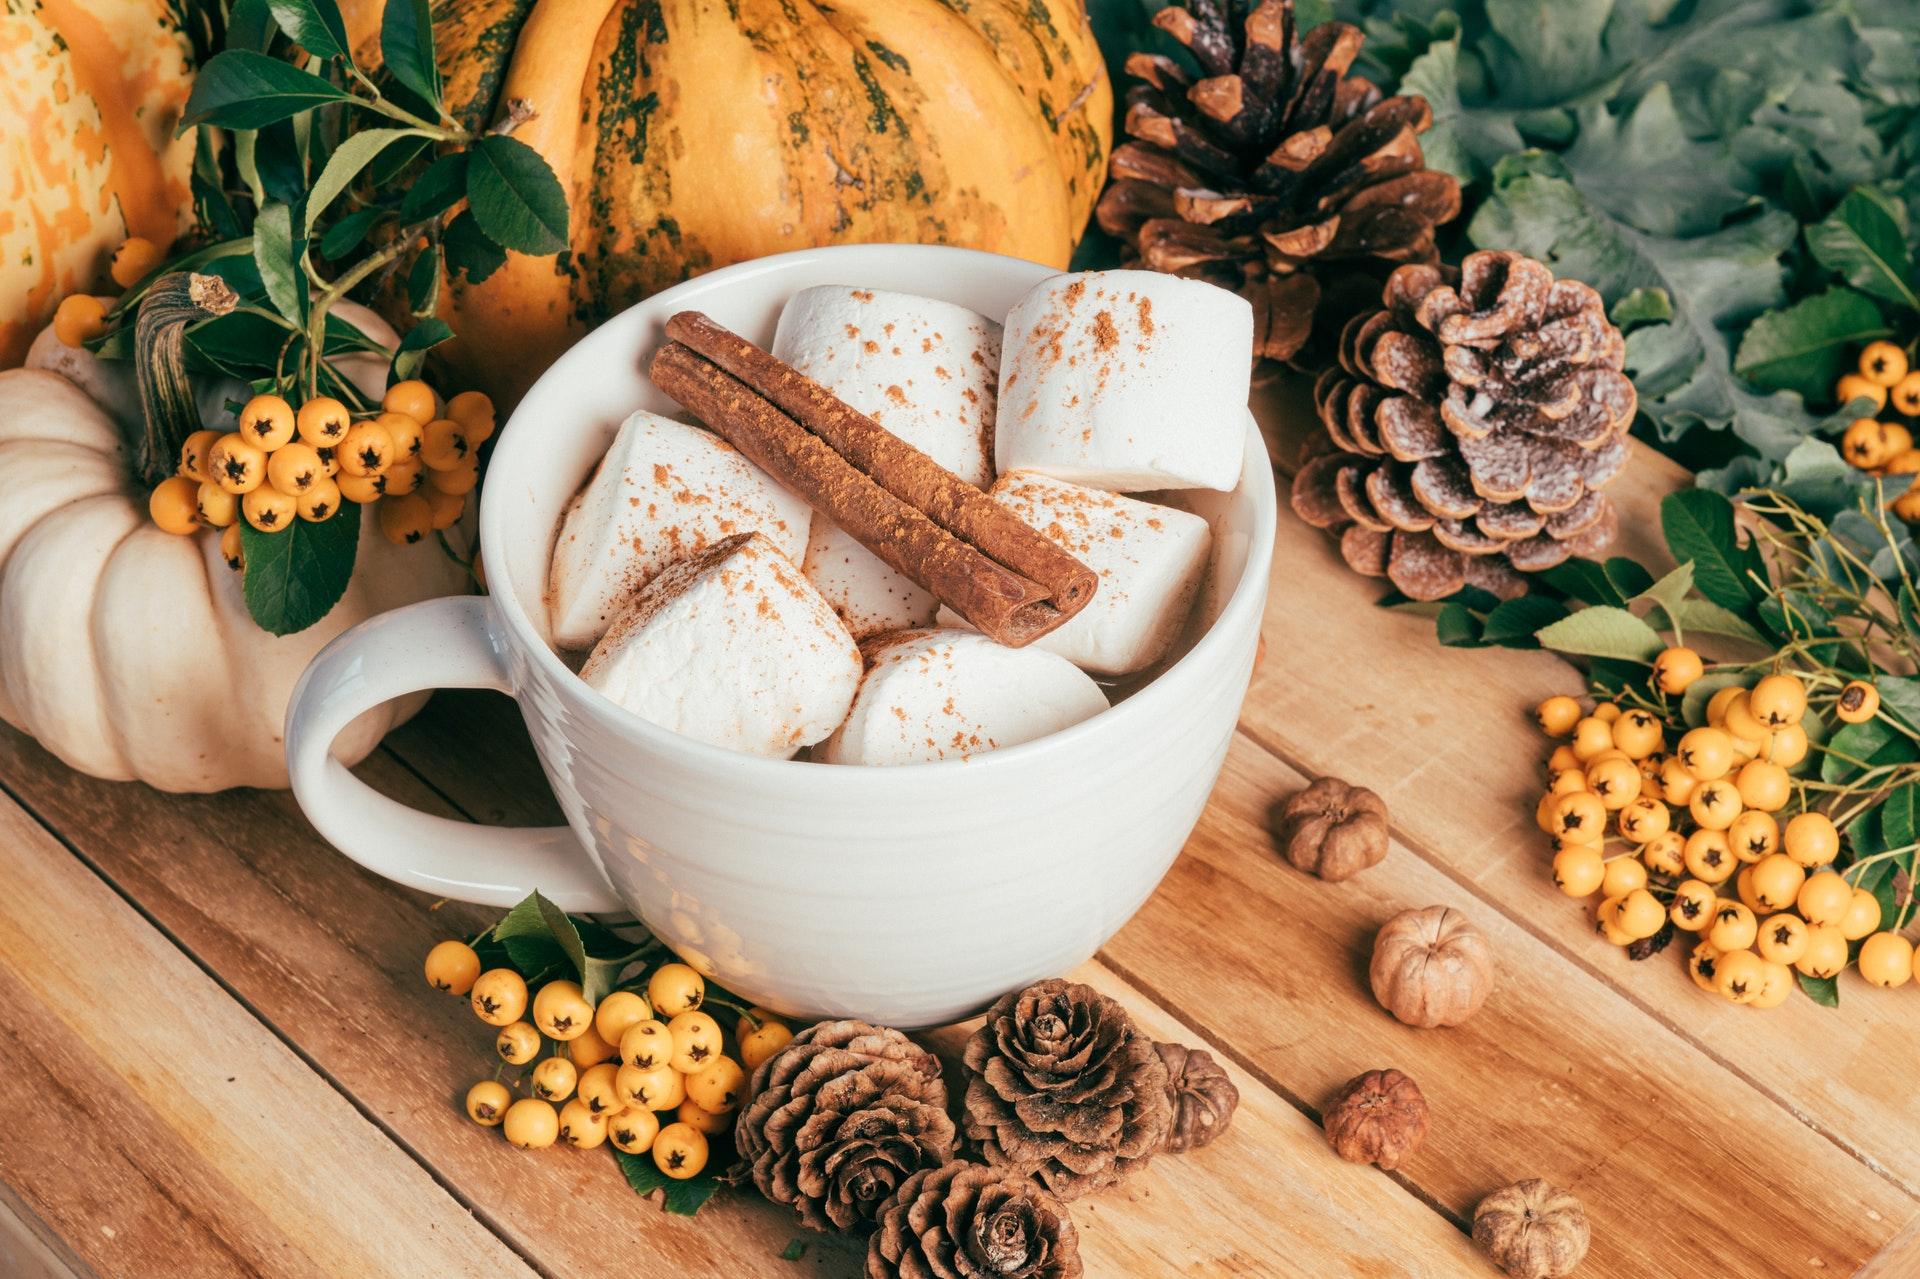 Photo of a Mug Full of Marshmallows